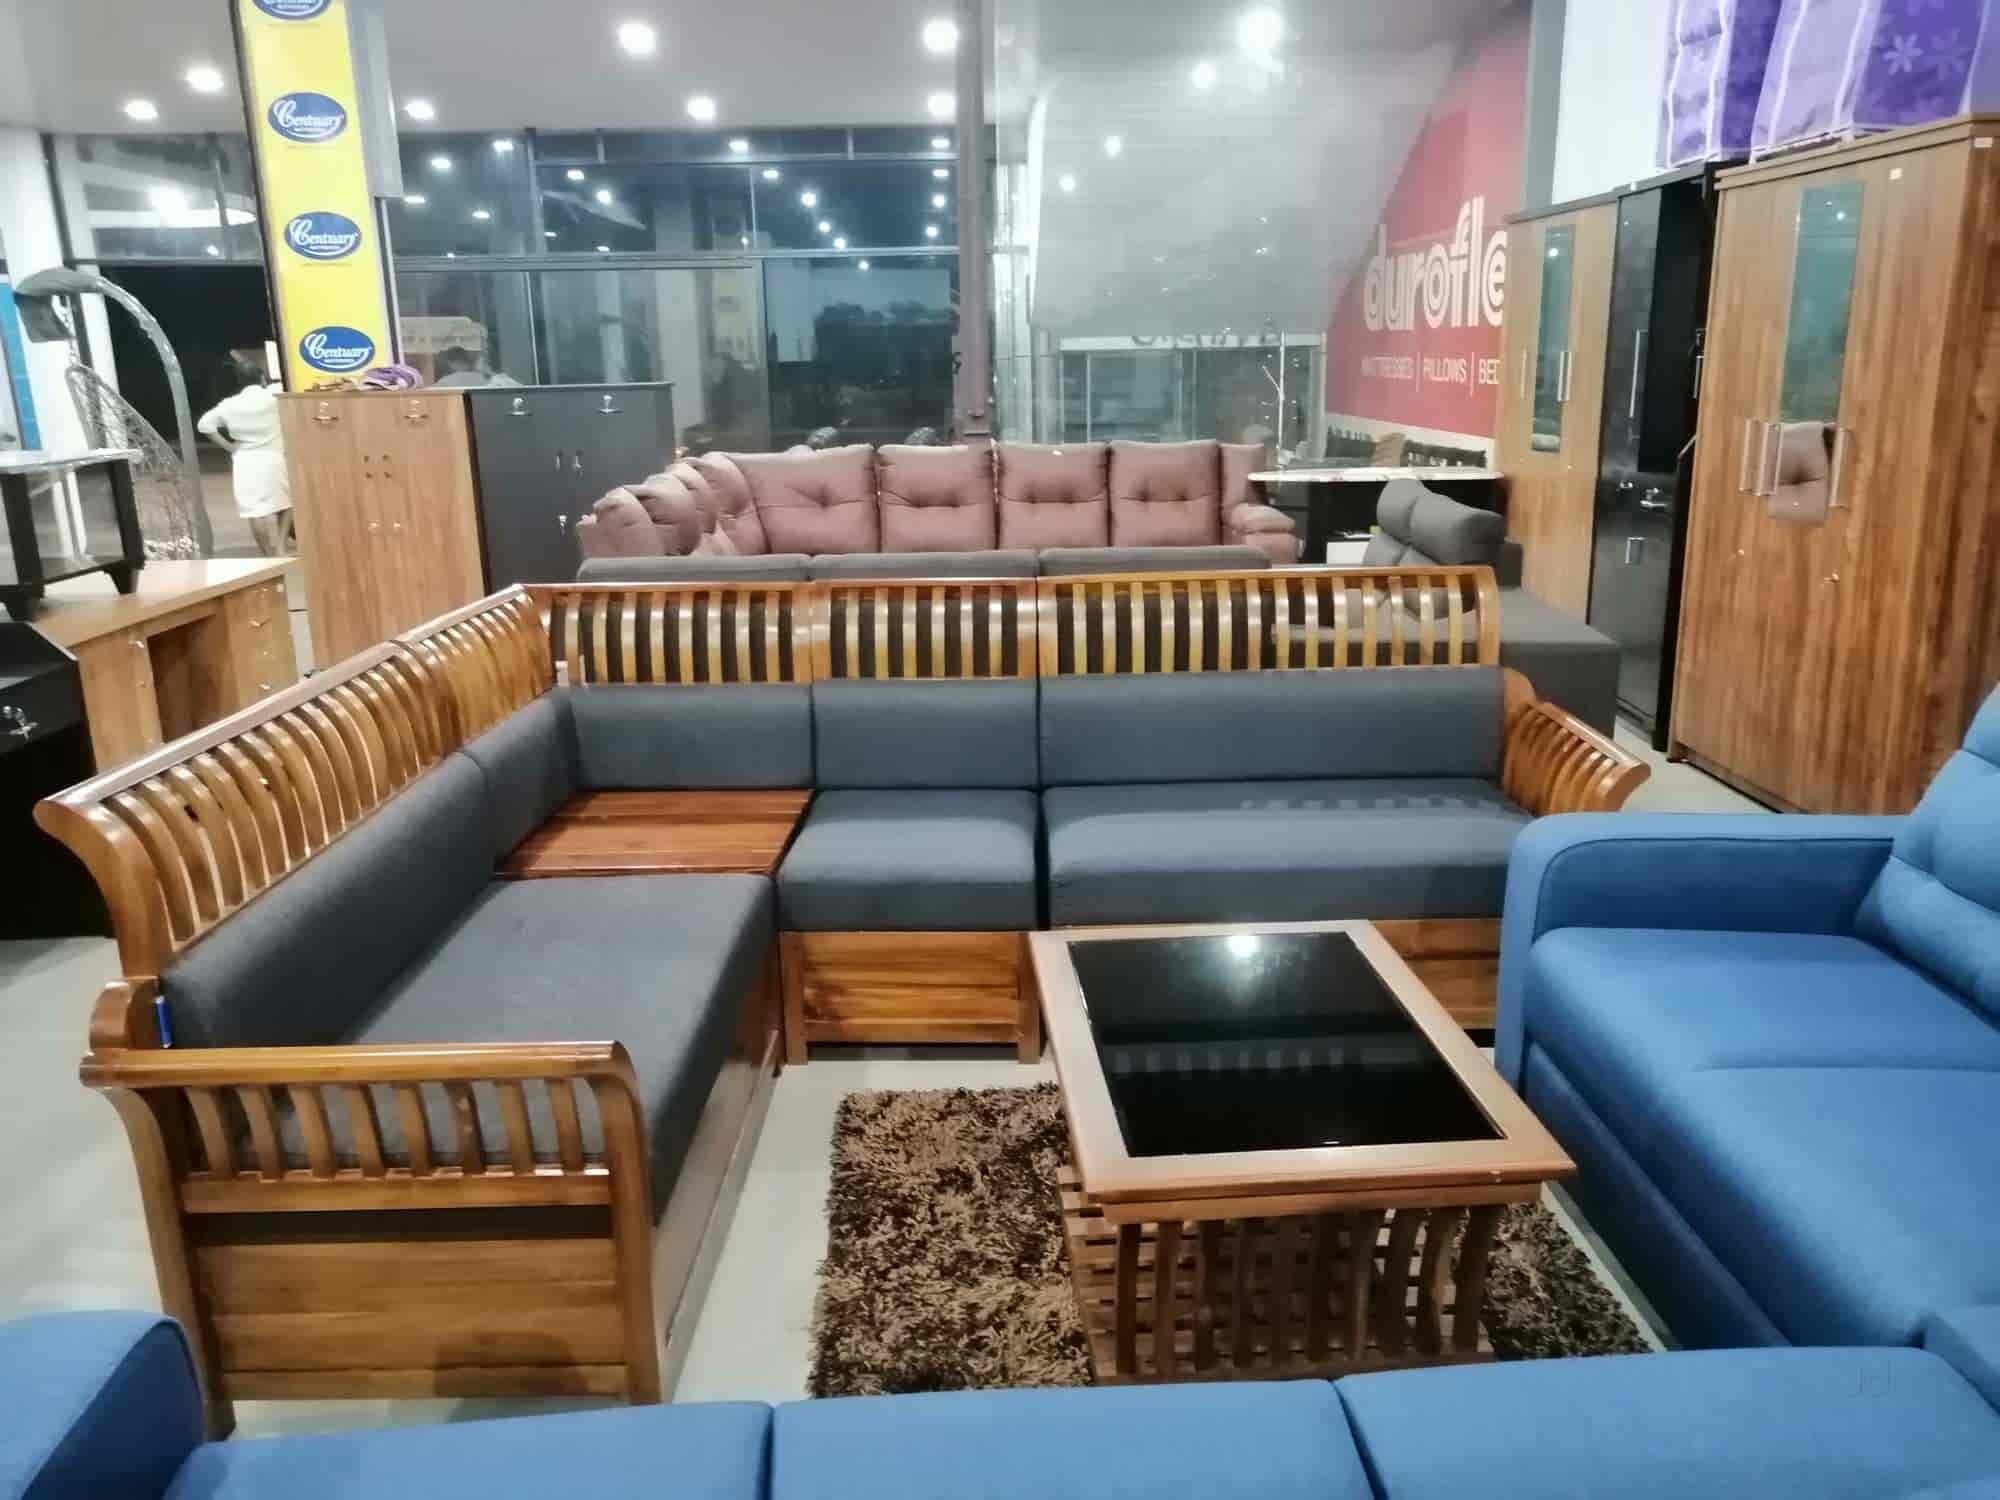 Grand Furniture, Wandoor - Furniture Dealers in Malappuram - Justdial